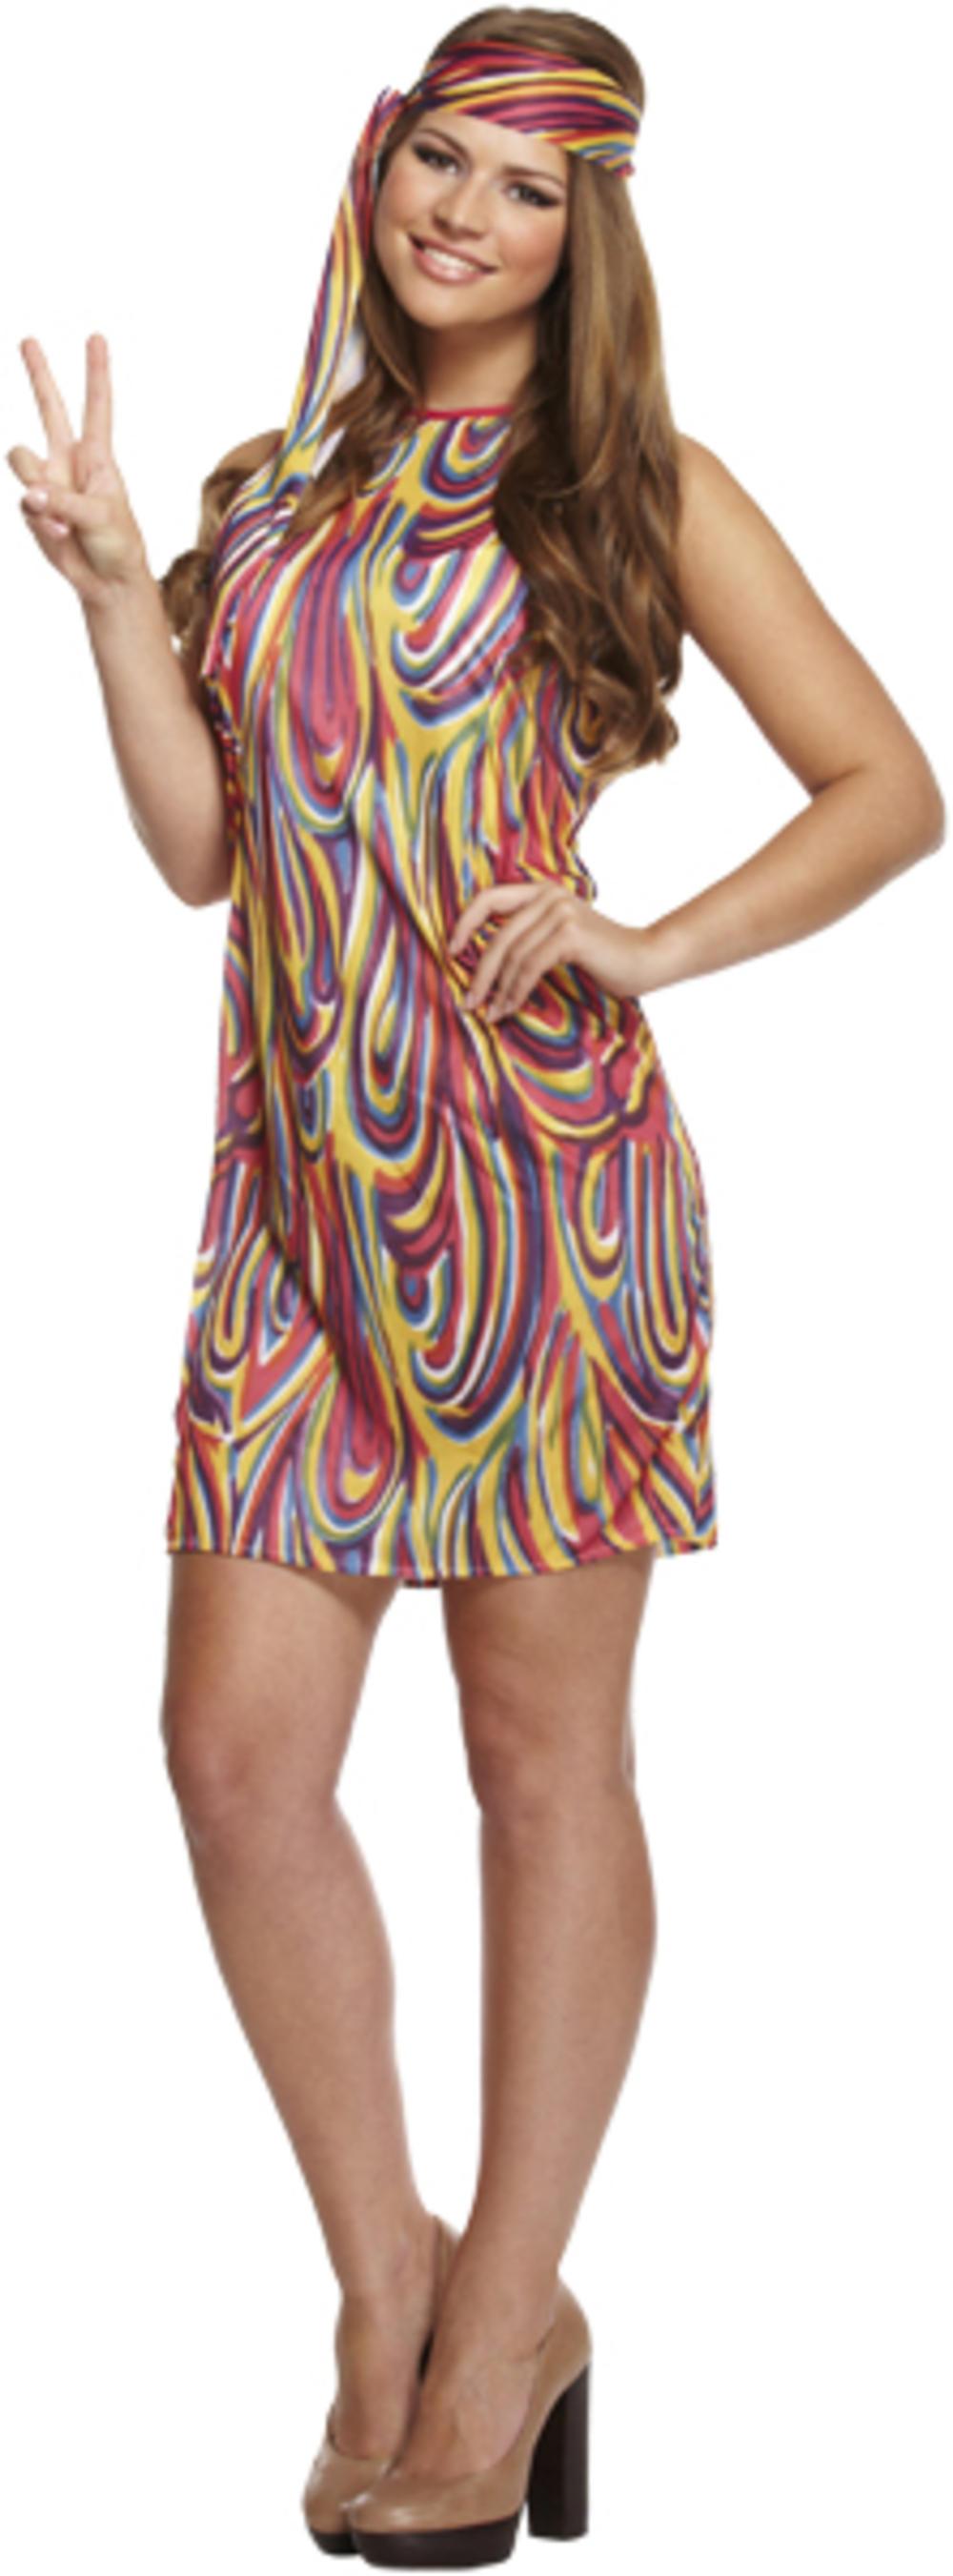 60s Groovy Girl Costume